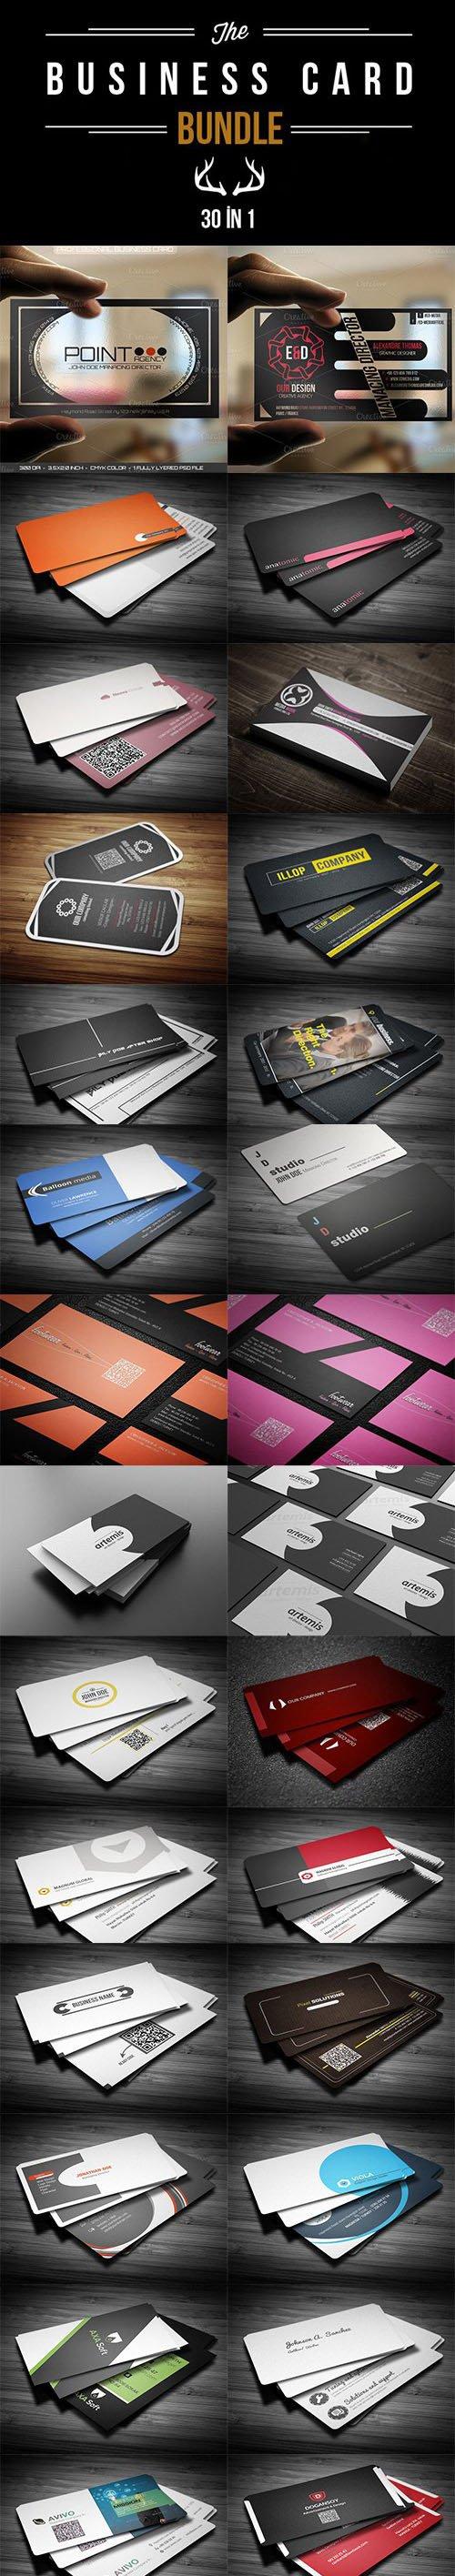 CM - The Business Card MEGA BUNDLE 1